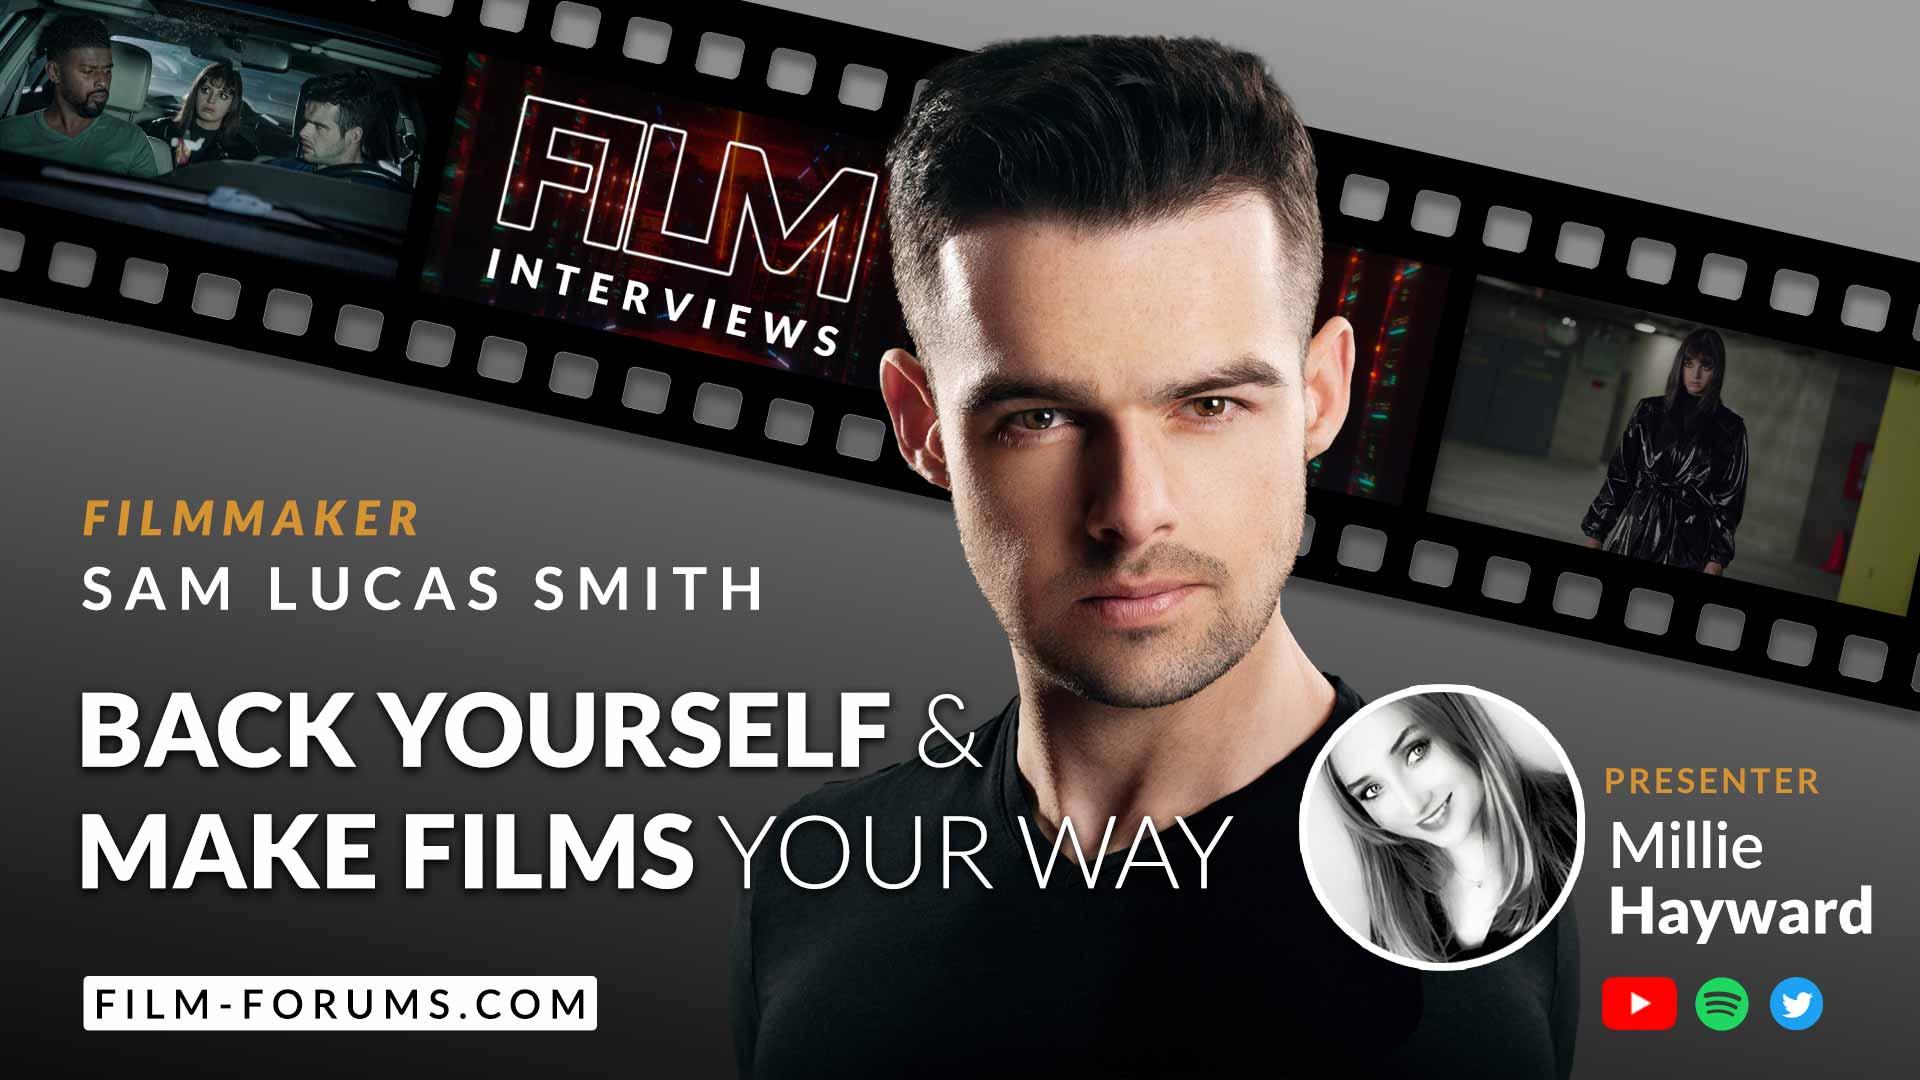 Sam Lucas Smith, filmmaker, Okay Google (2021)